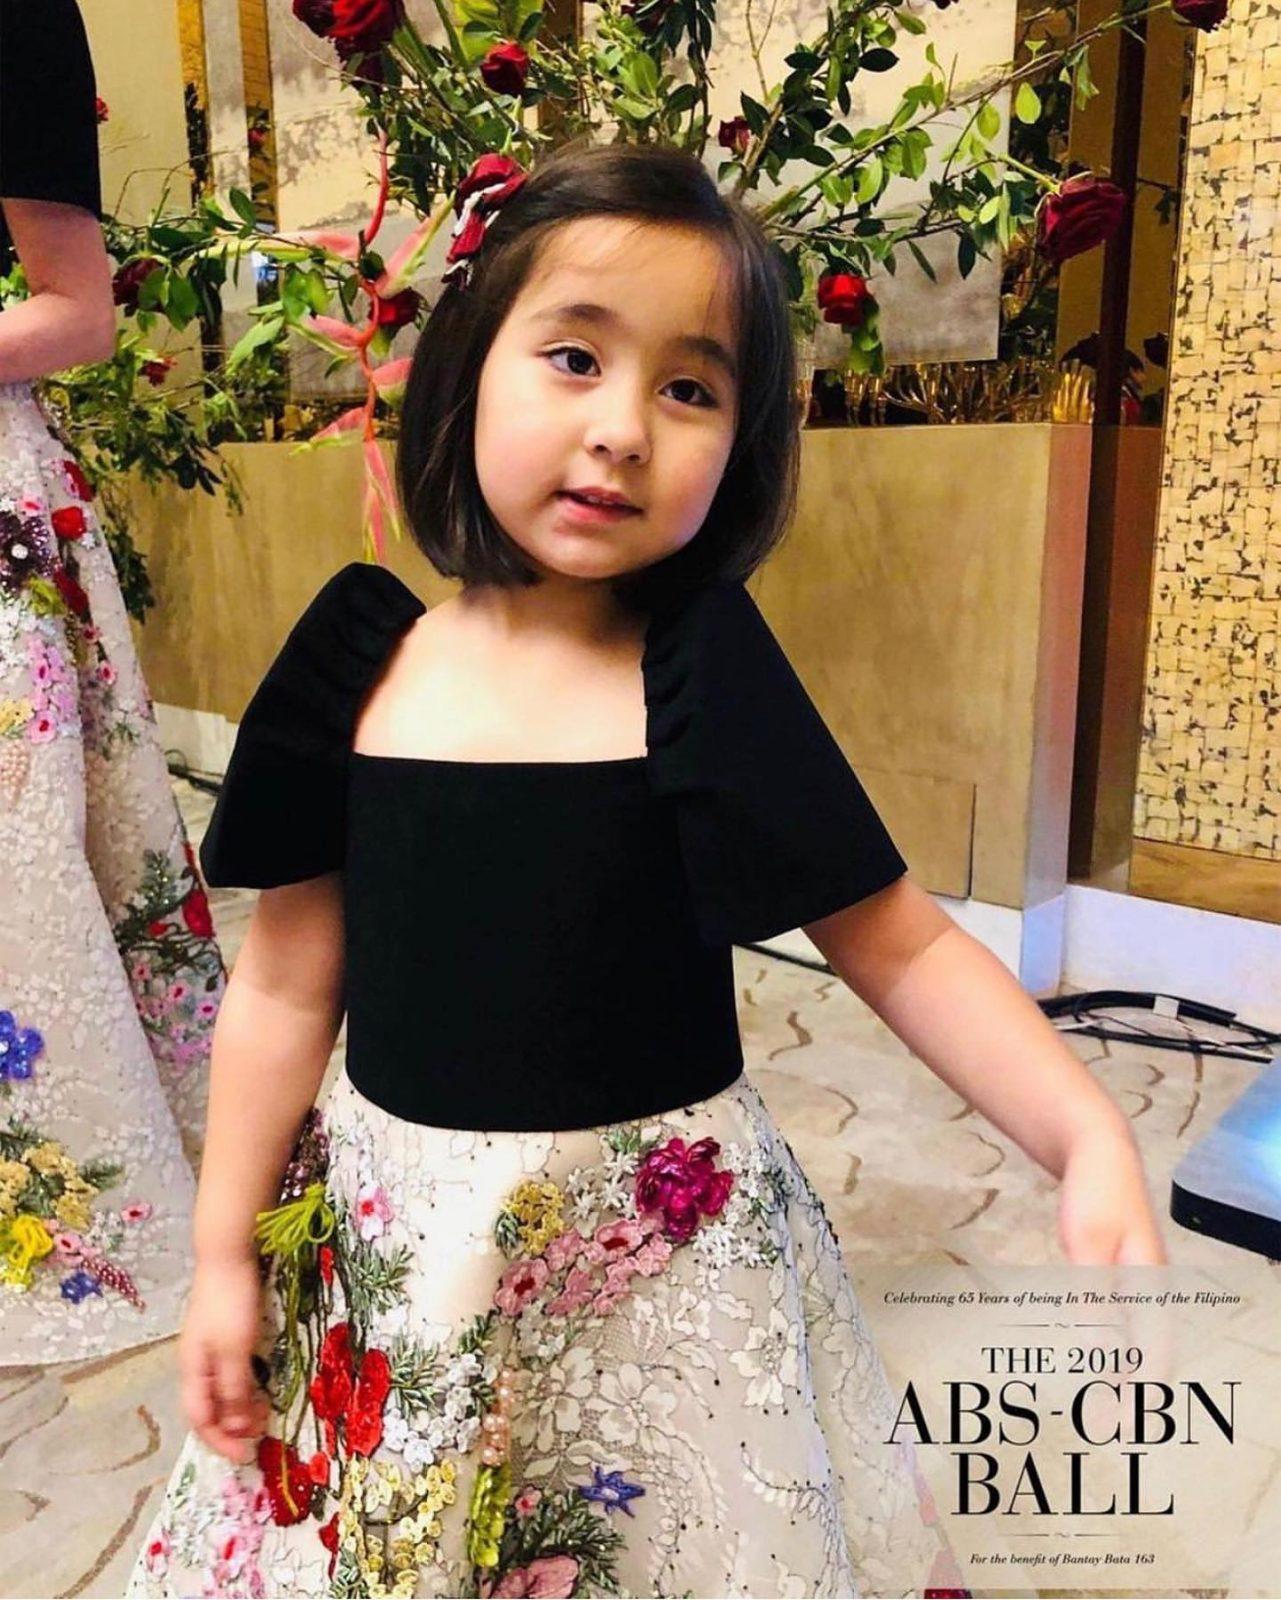 Youngest tourism ambassador Scarlet Snow